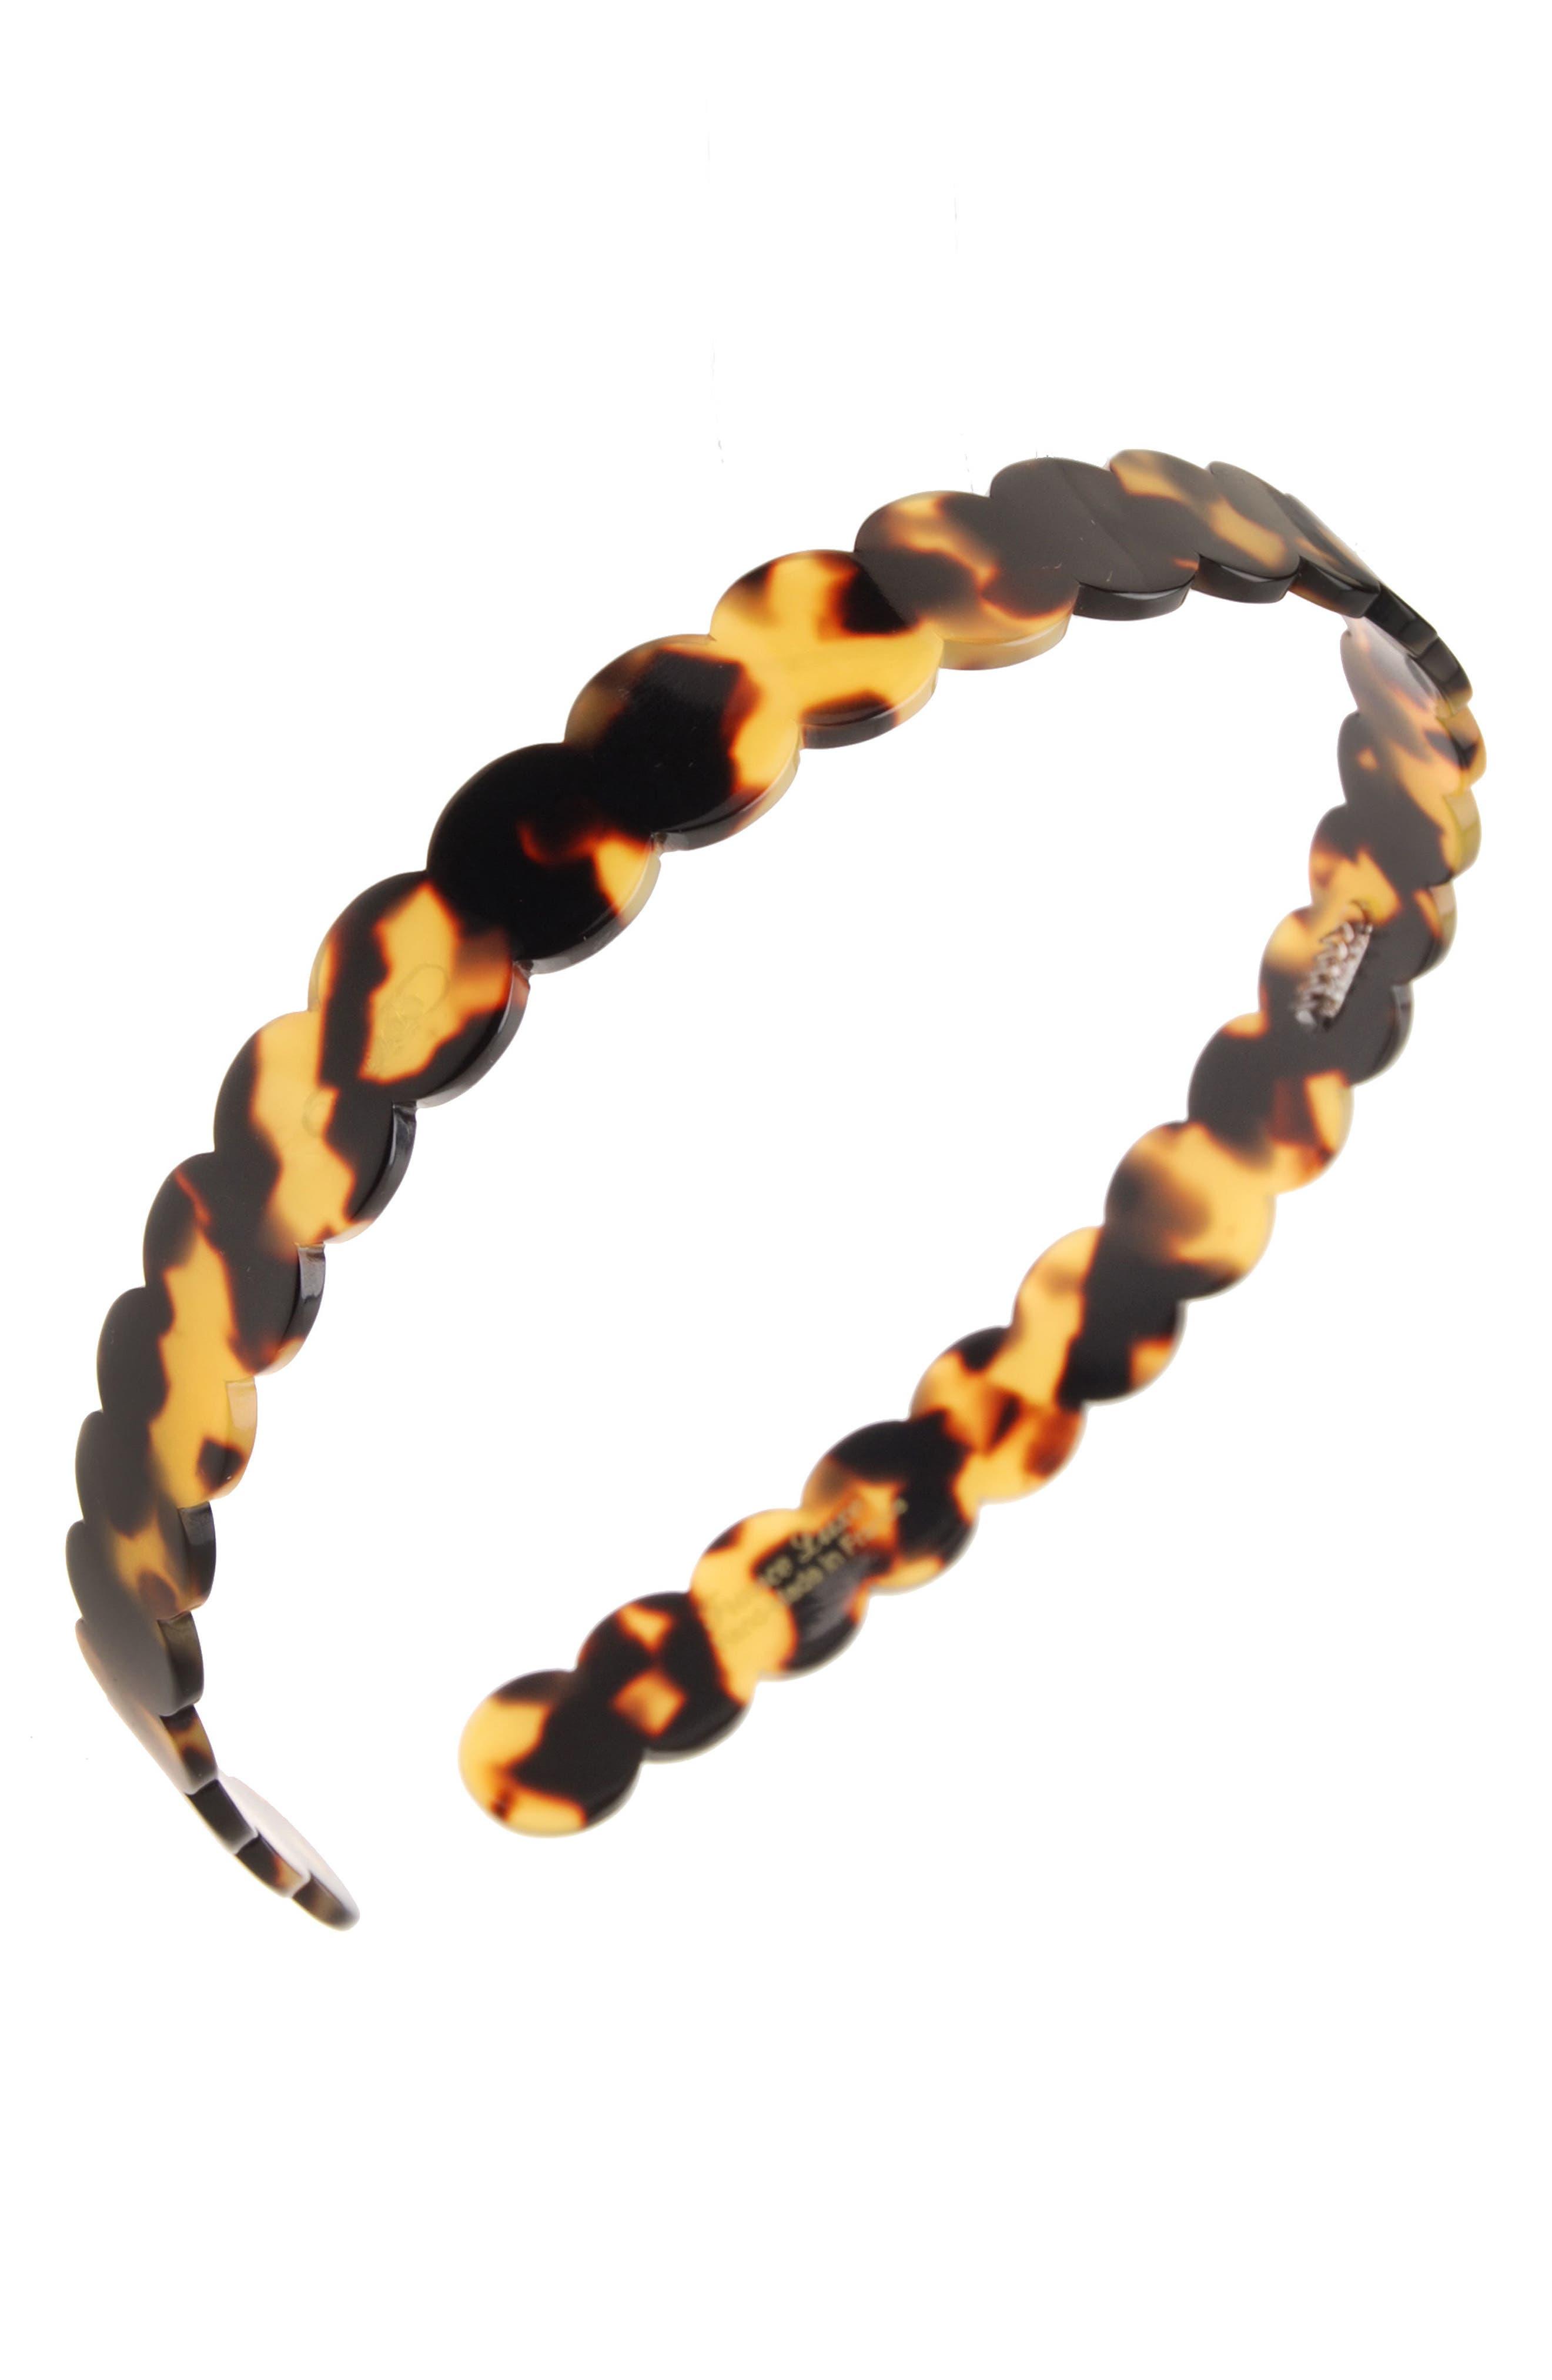 France Luxe Scallop Headband